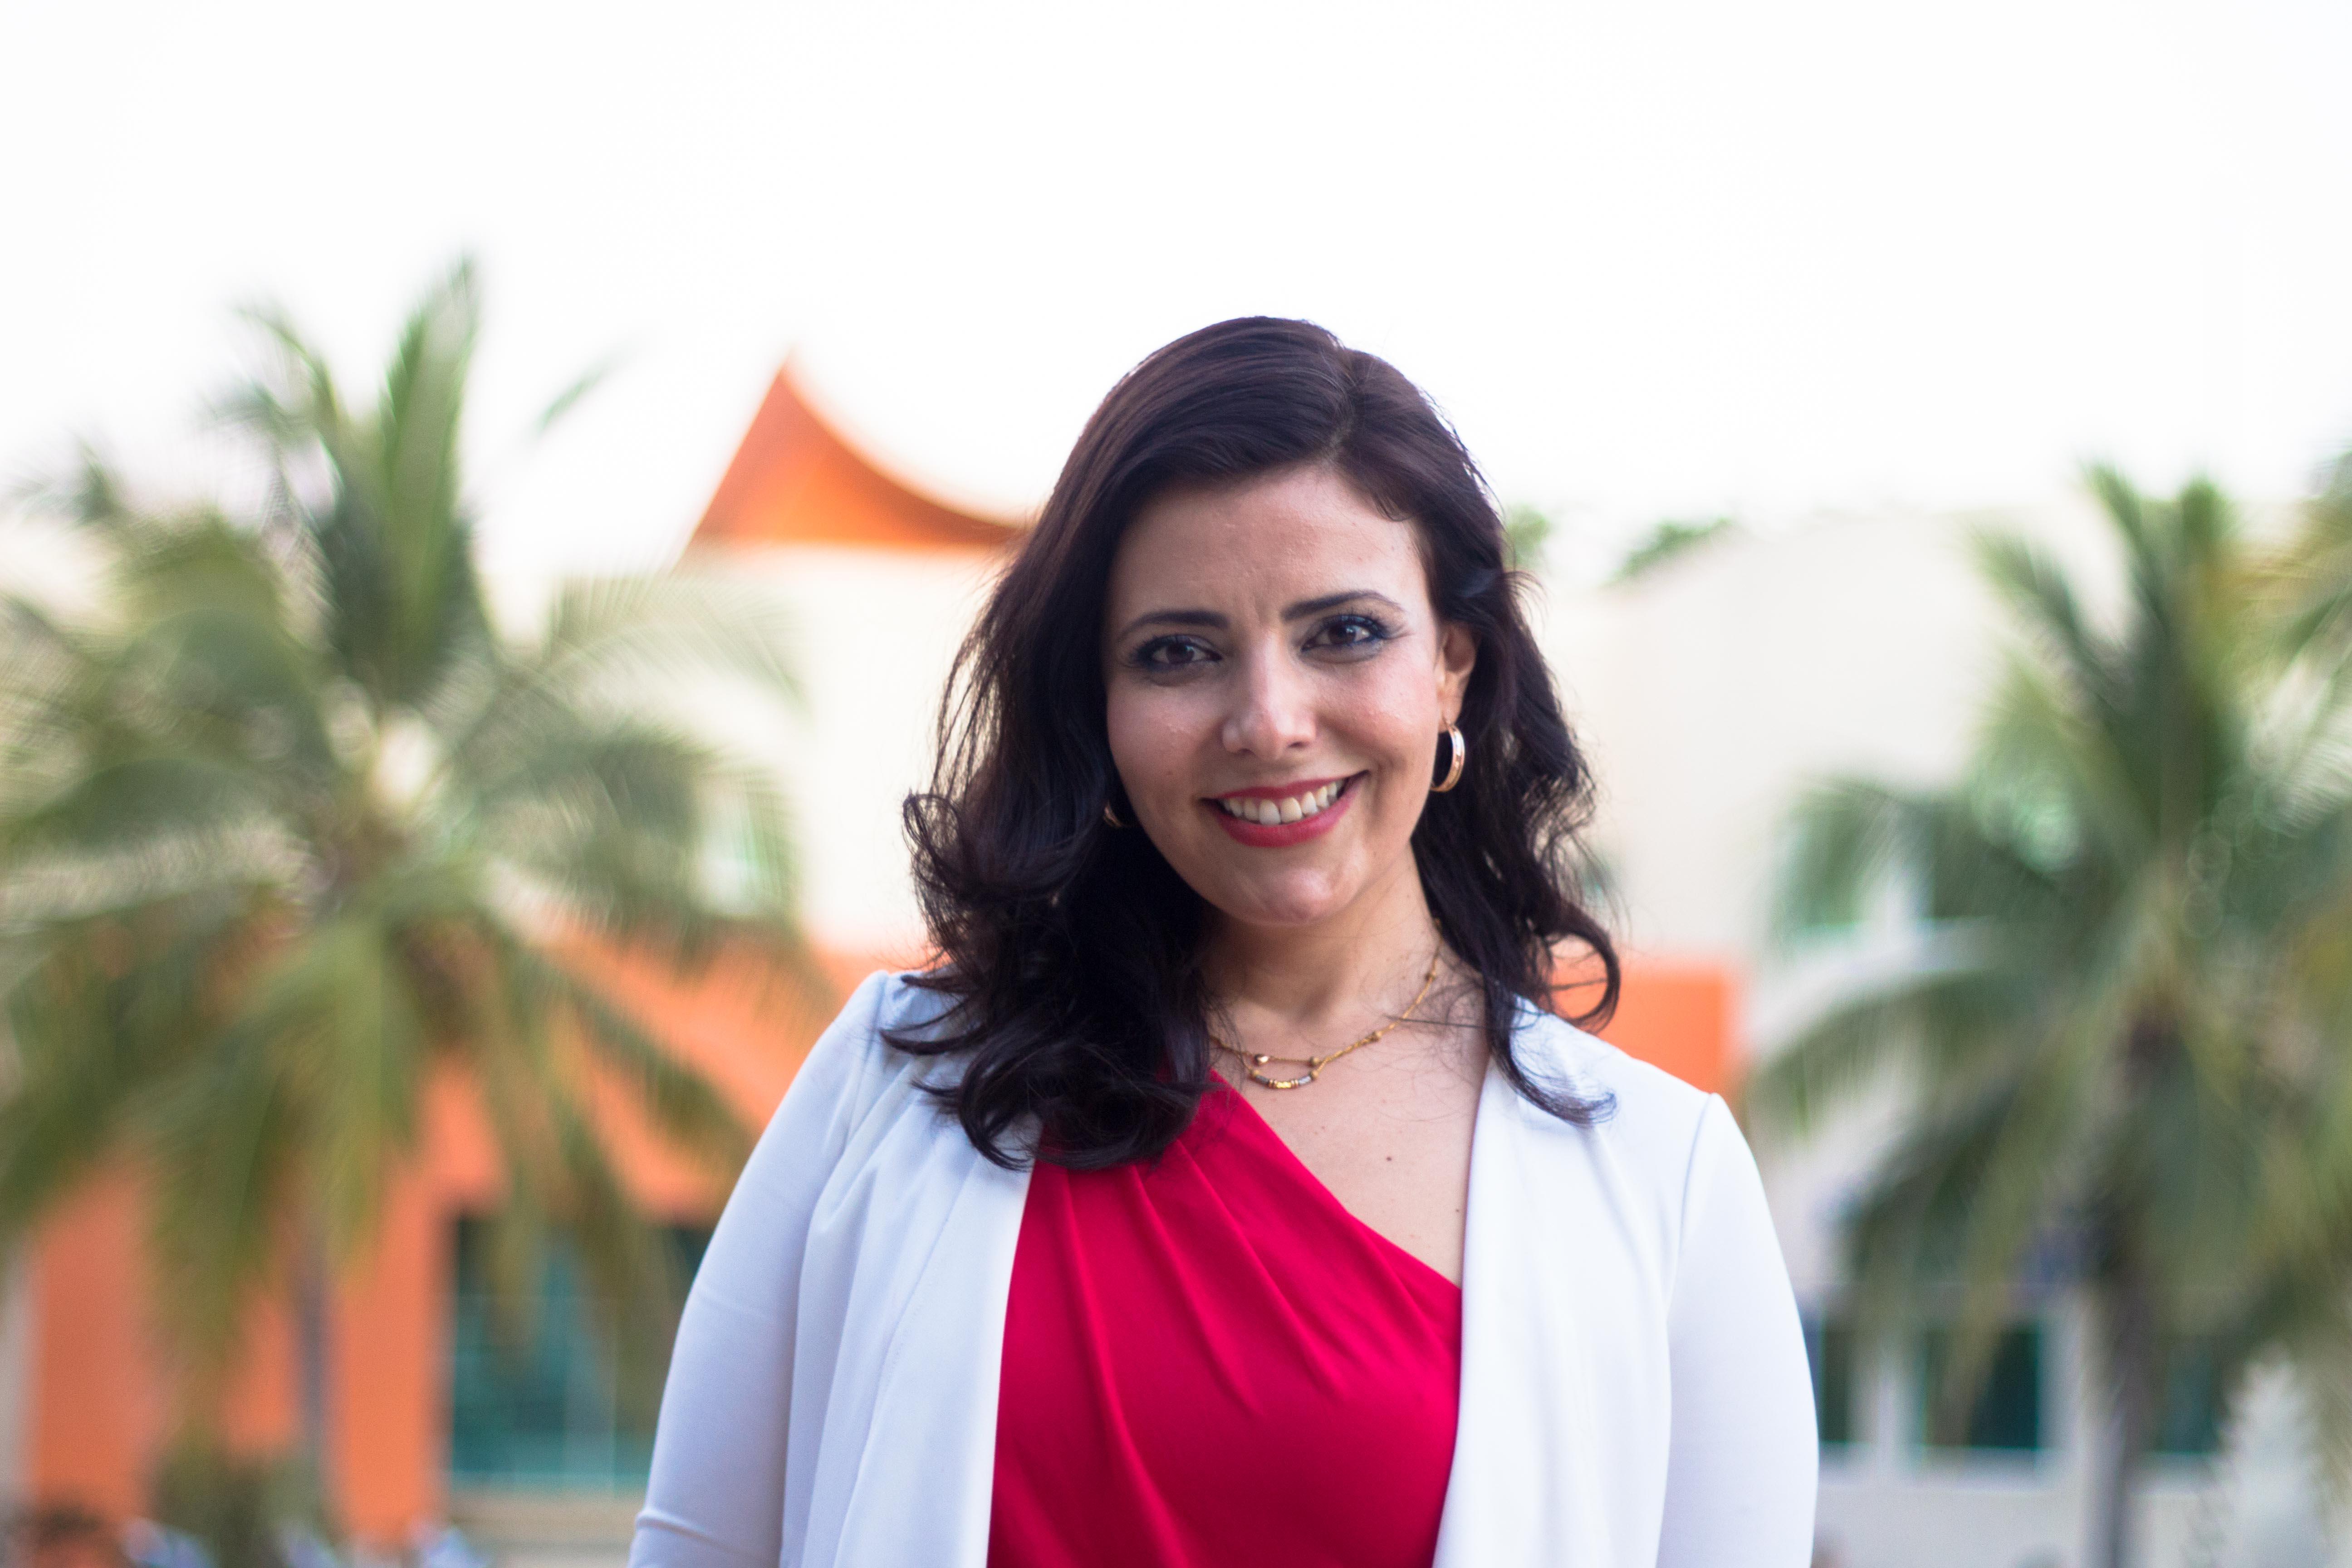 Dra. Edna Ramírez, directora de la consultora GoBiz Global